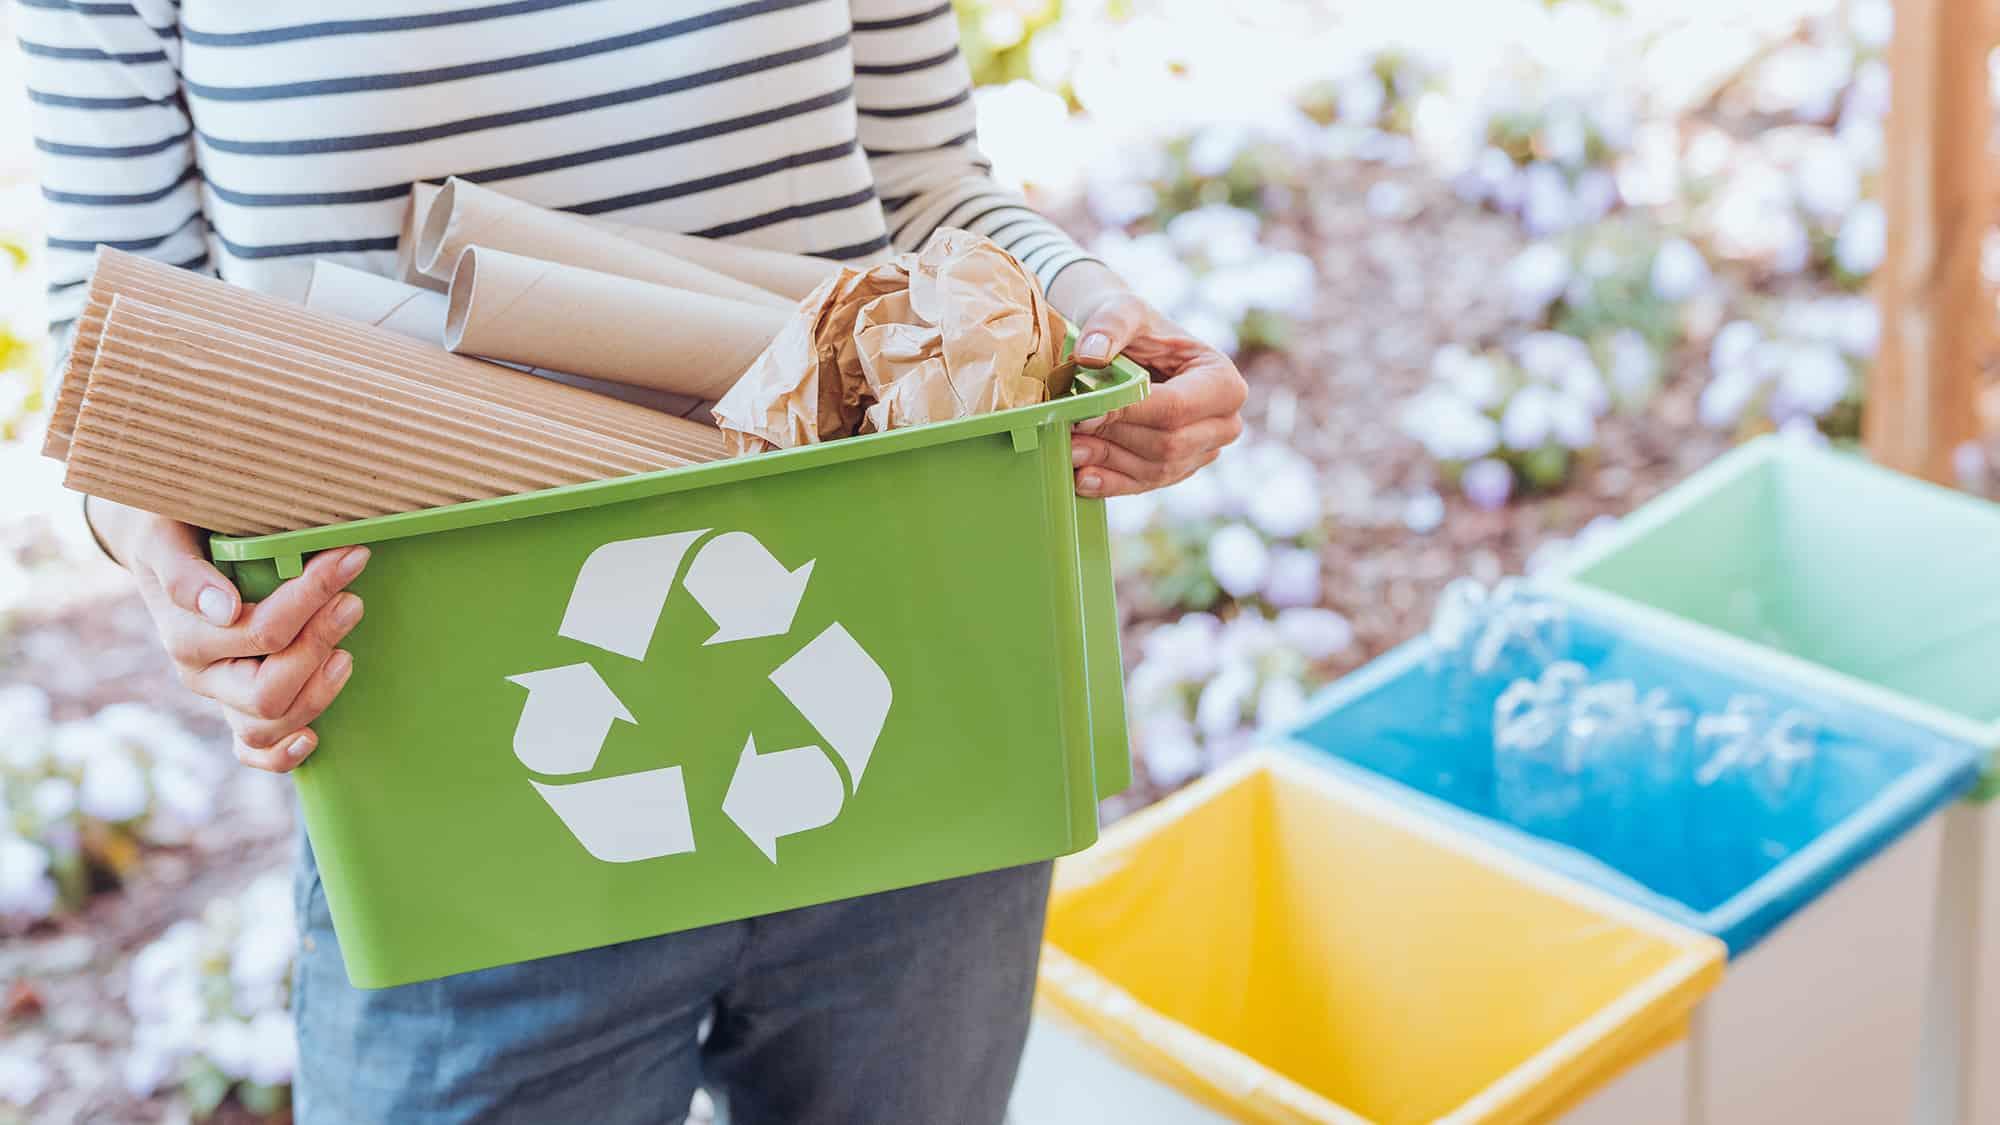 Activist sorting paper waste